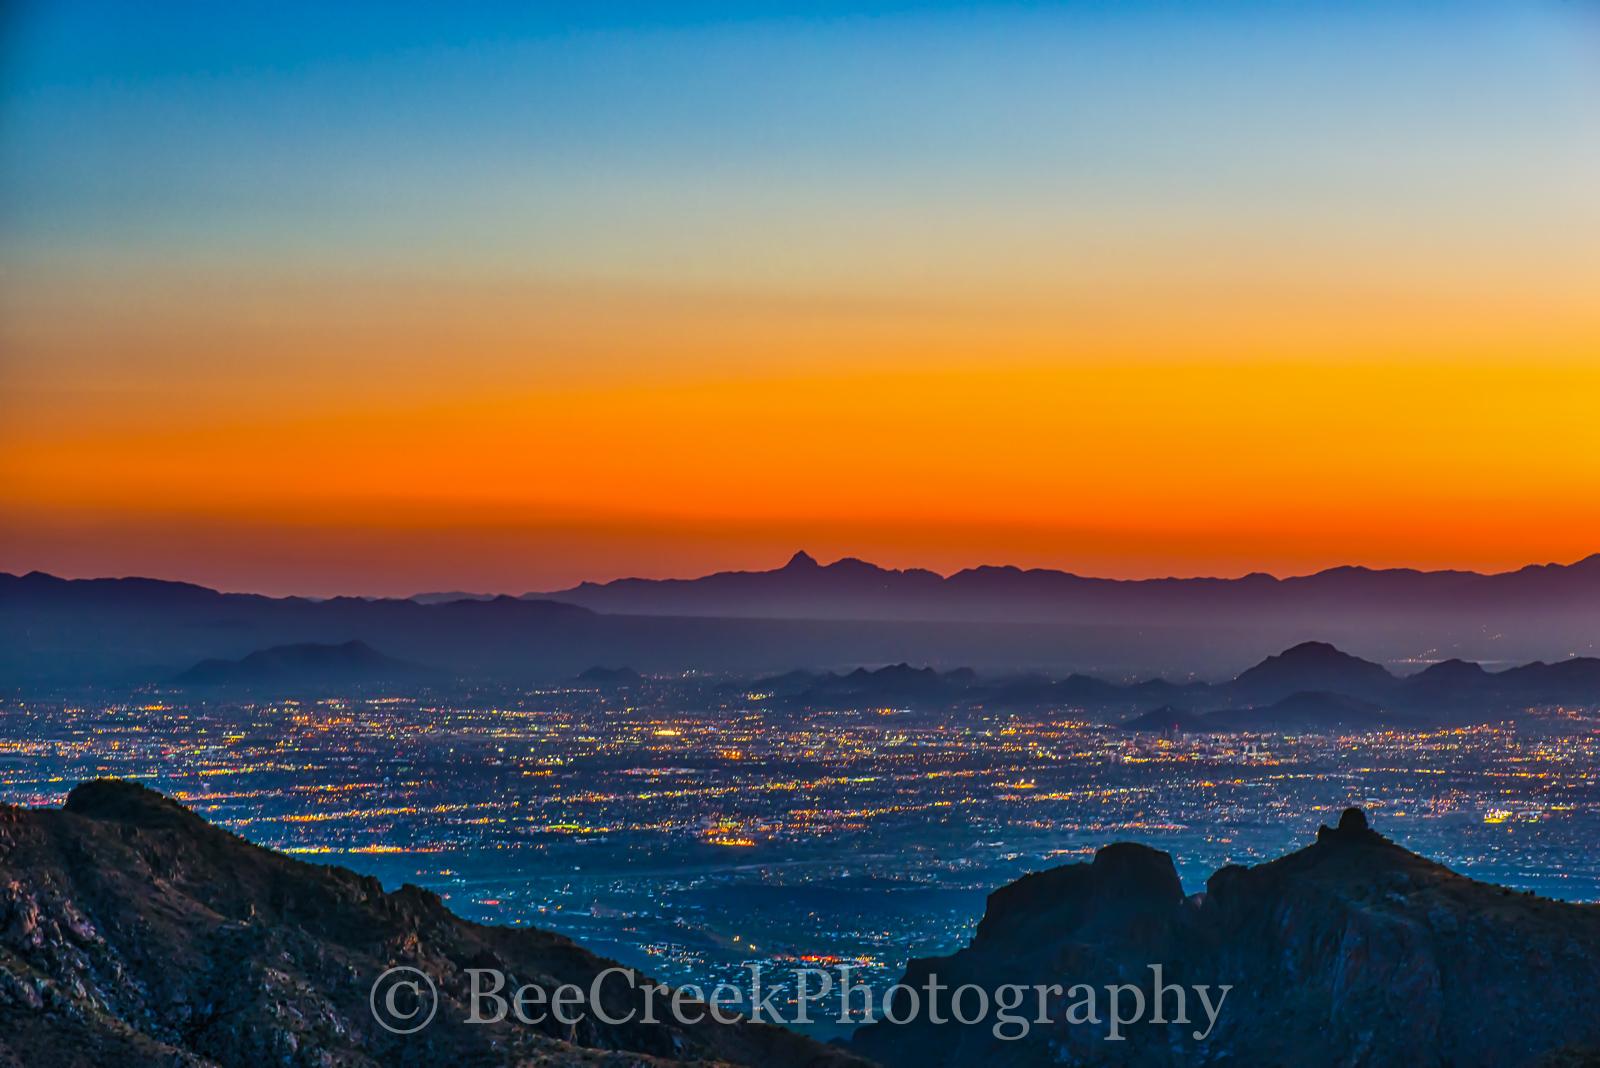 Sunset, Tucson, Santa Catalinas Mountains, Tucson, mountains, colorful skies, scenic vista, orange, City, City lights, Cityscape, Tucson, skyline of Tucson, City lights of Tucson from Mountains, image, photo